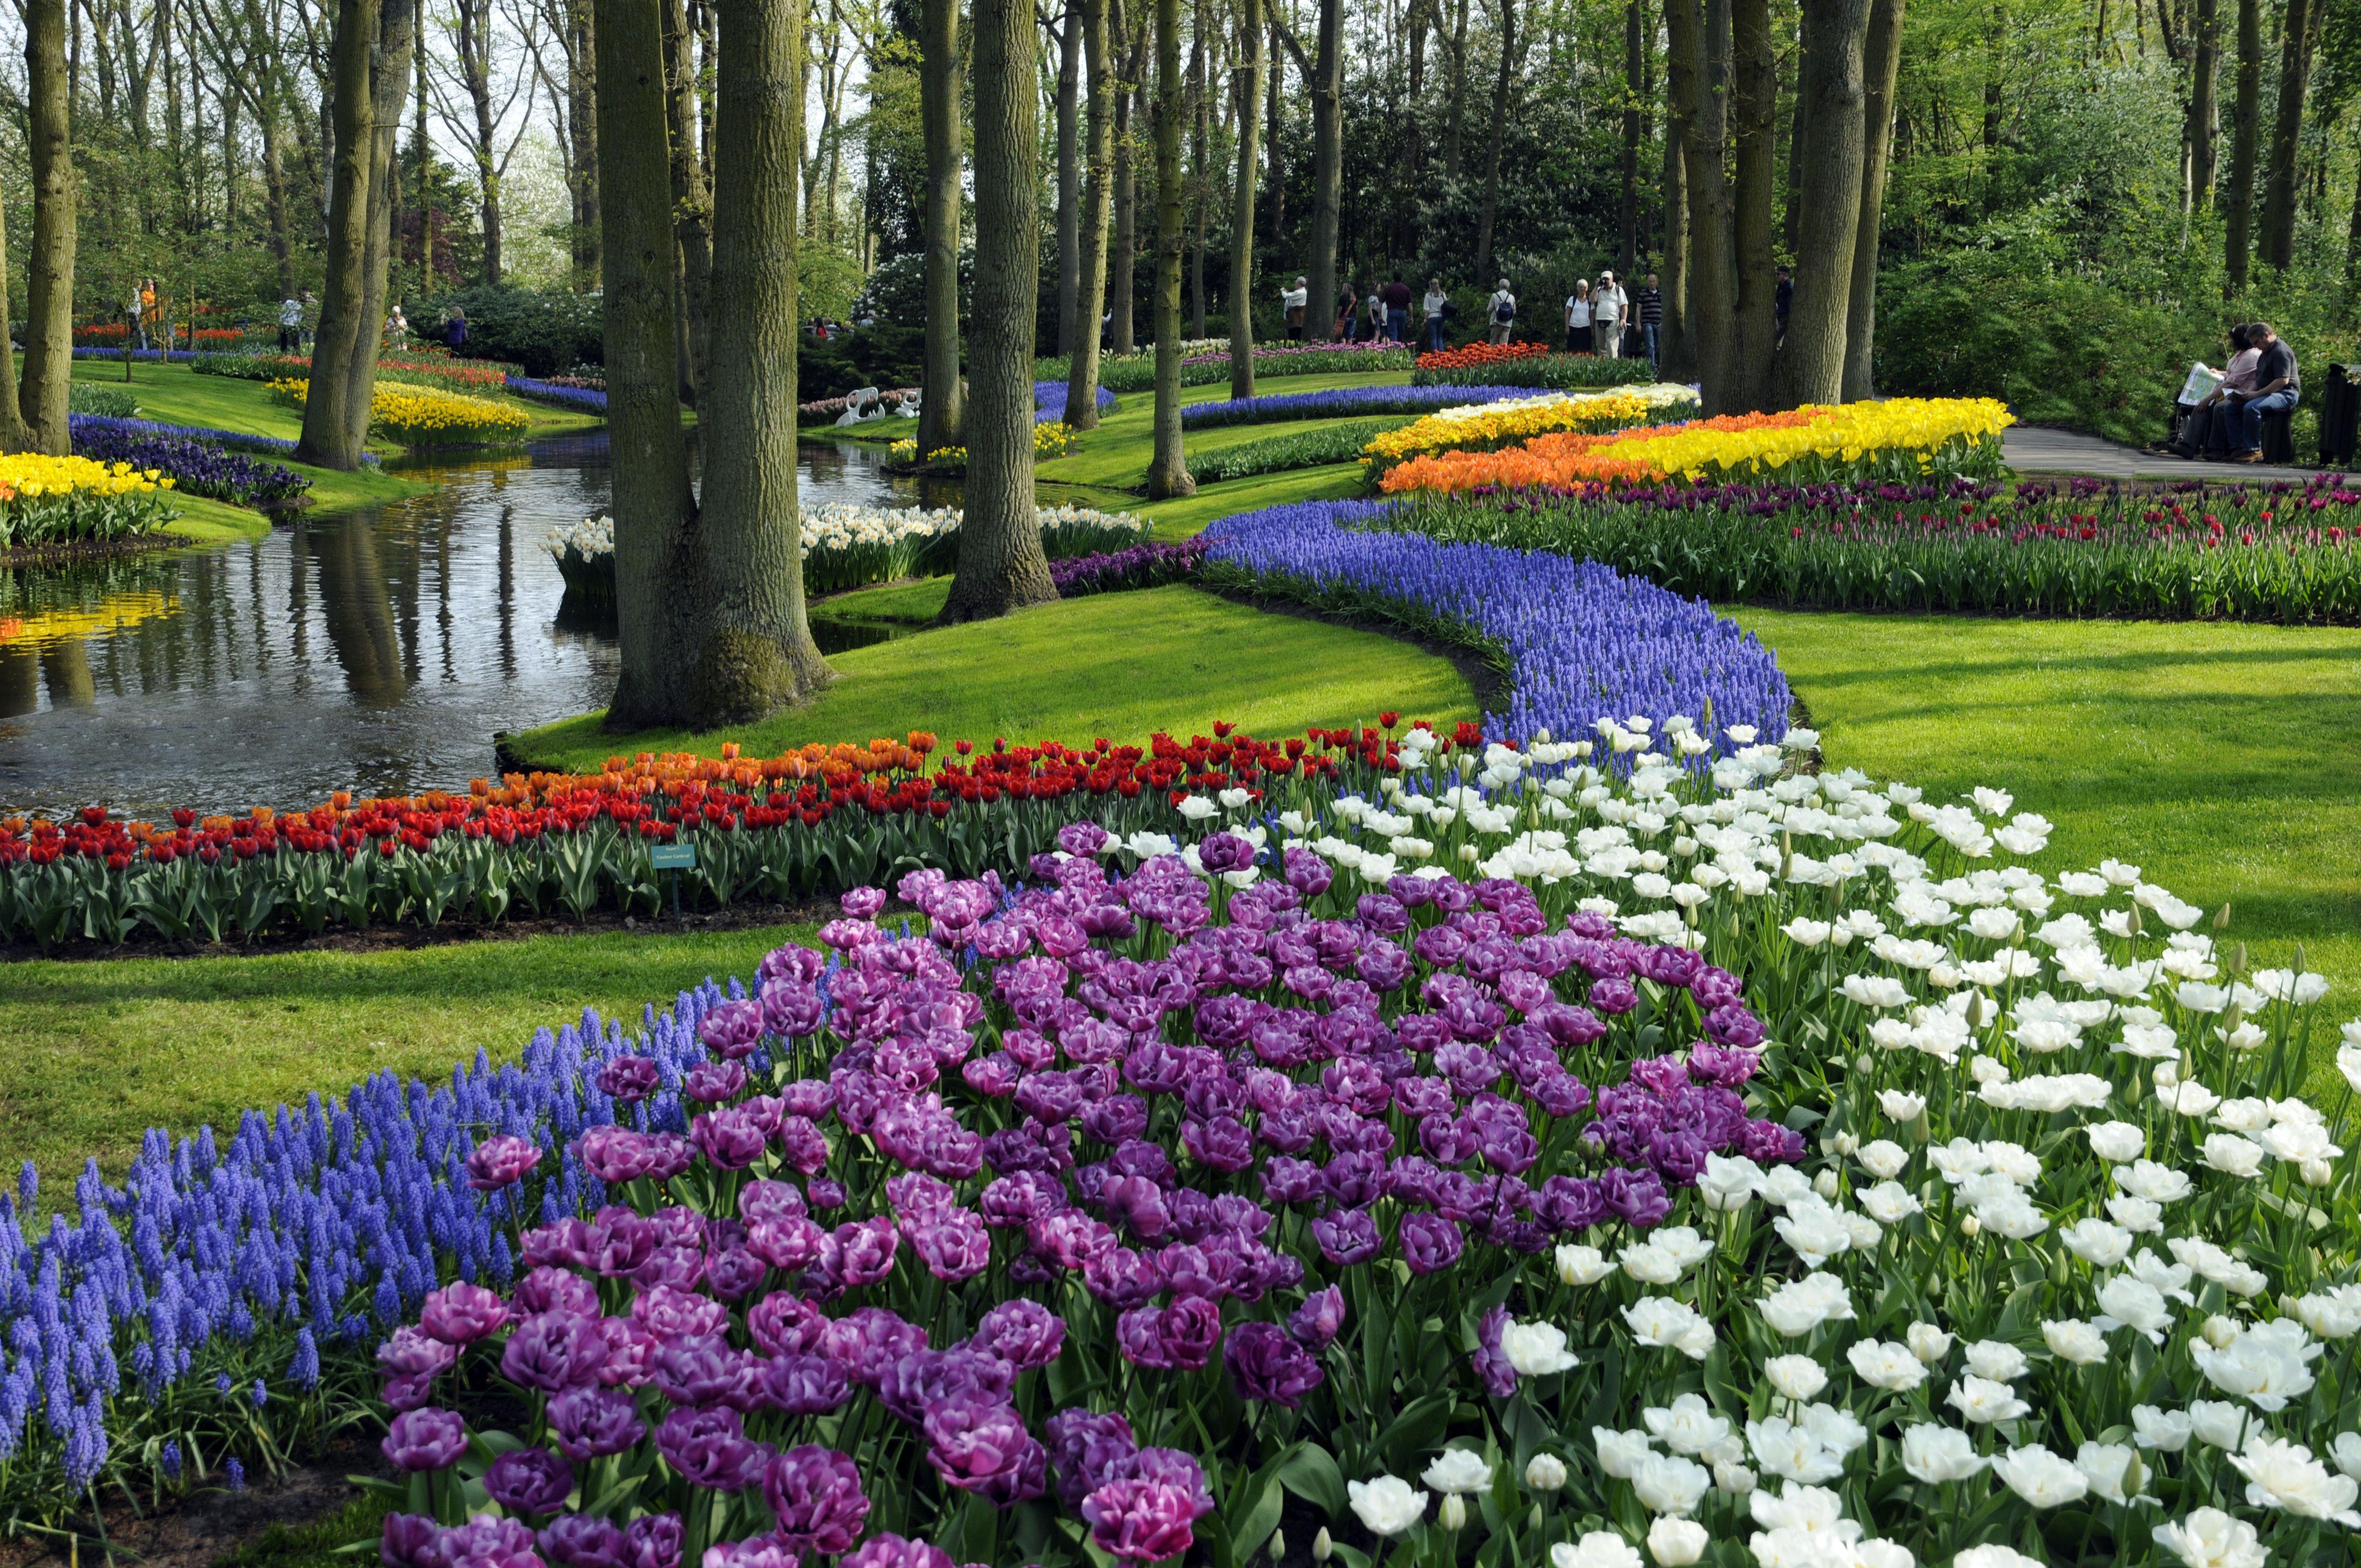 keukenhof – the garden of europe - netherlands tourism